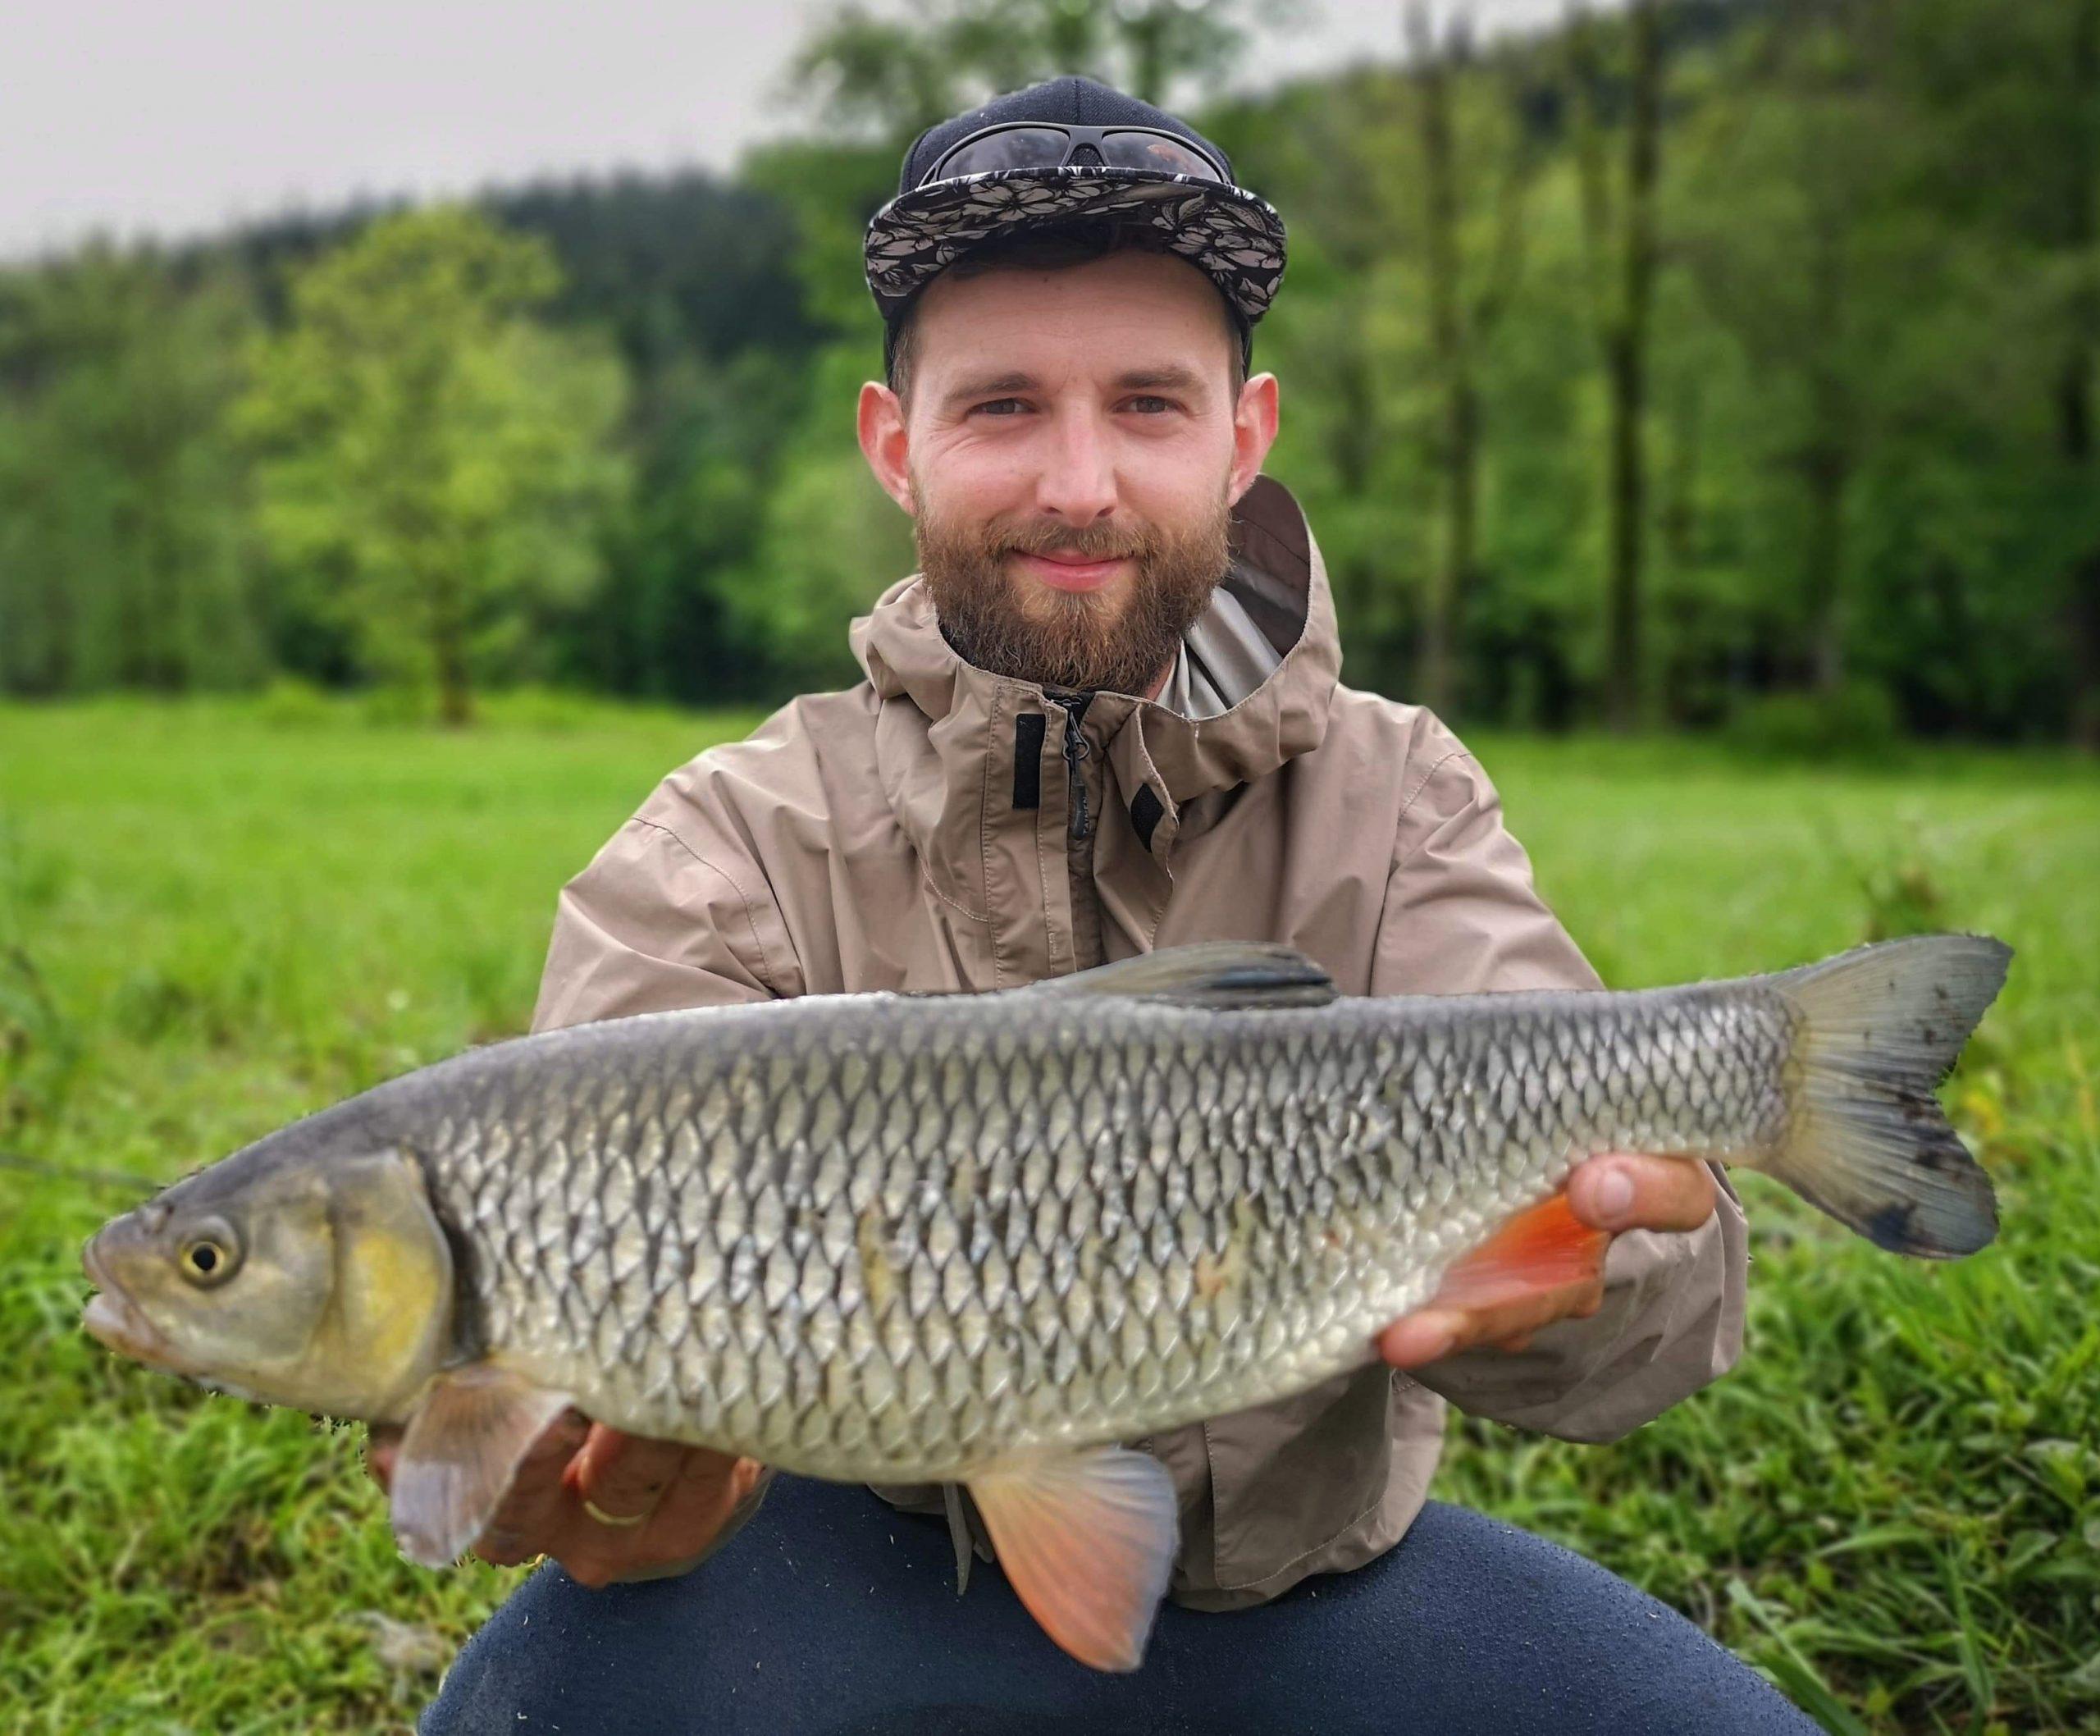 Dunajec and chub - nymph fishing - Poland